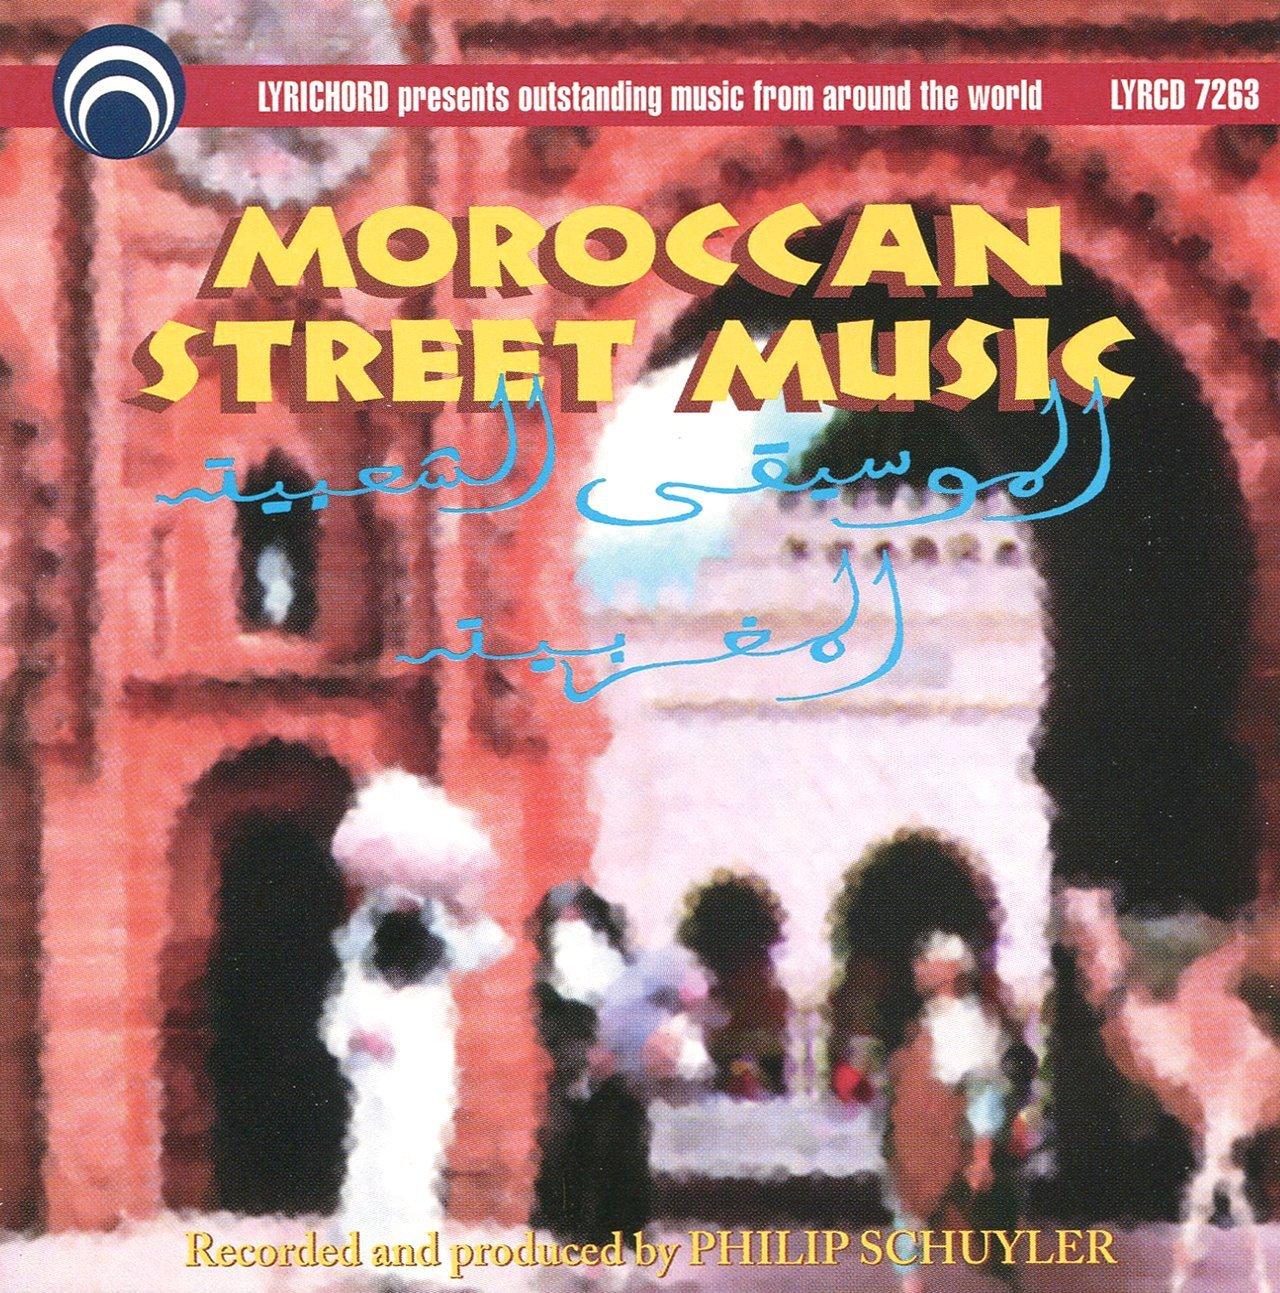 Moroccan Street Music by Lyrichord